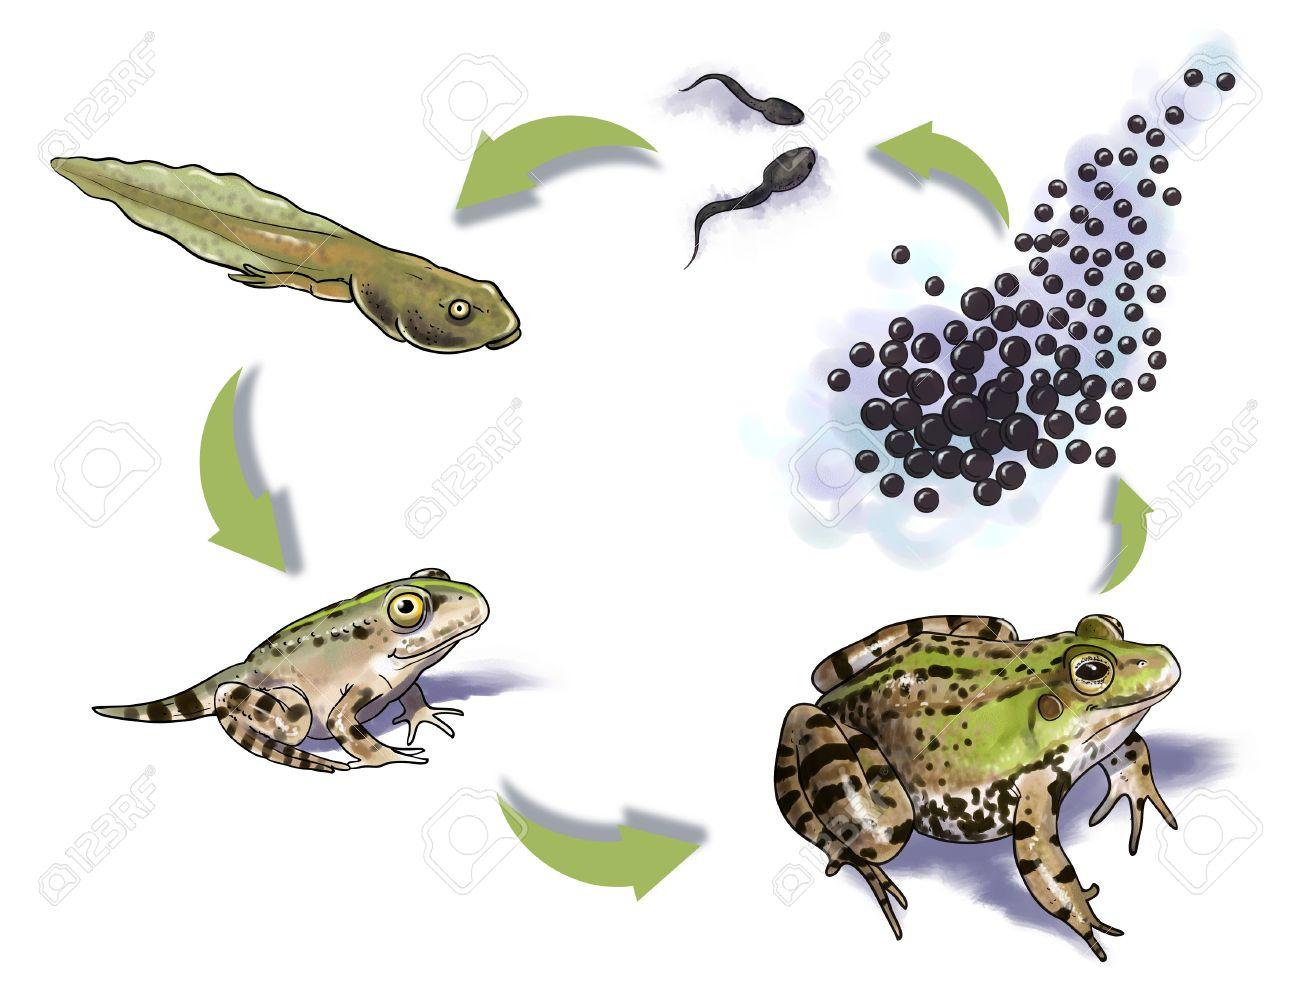 Digital Illustration Of A Frog Life Cycle intérieur Cycle De Vie Grenouille